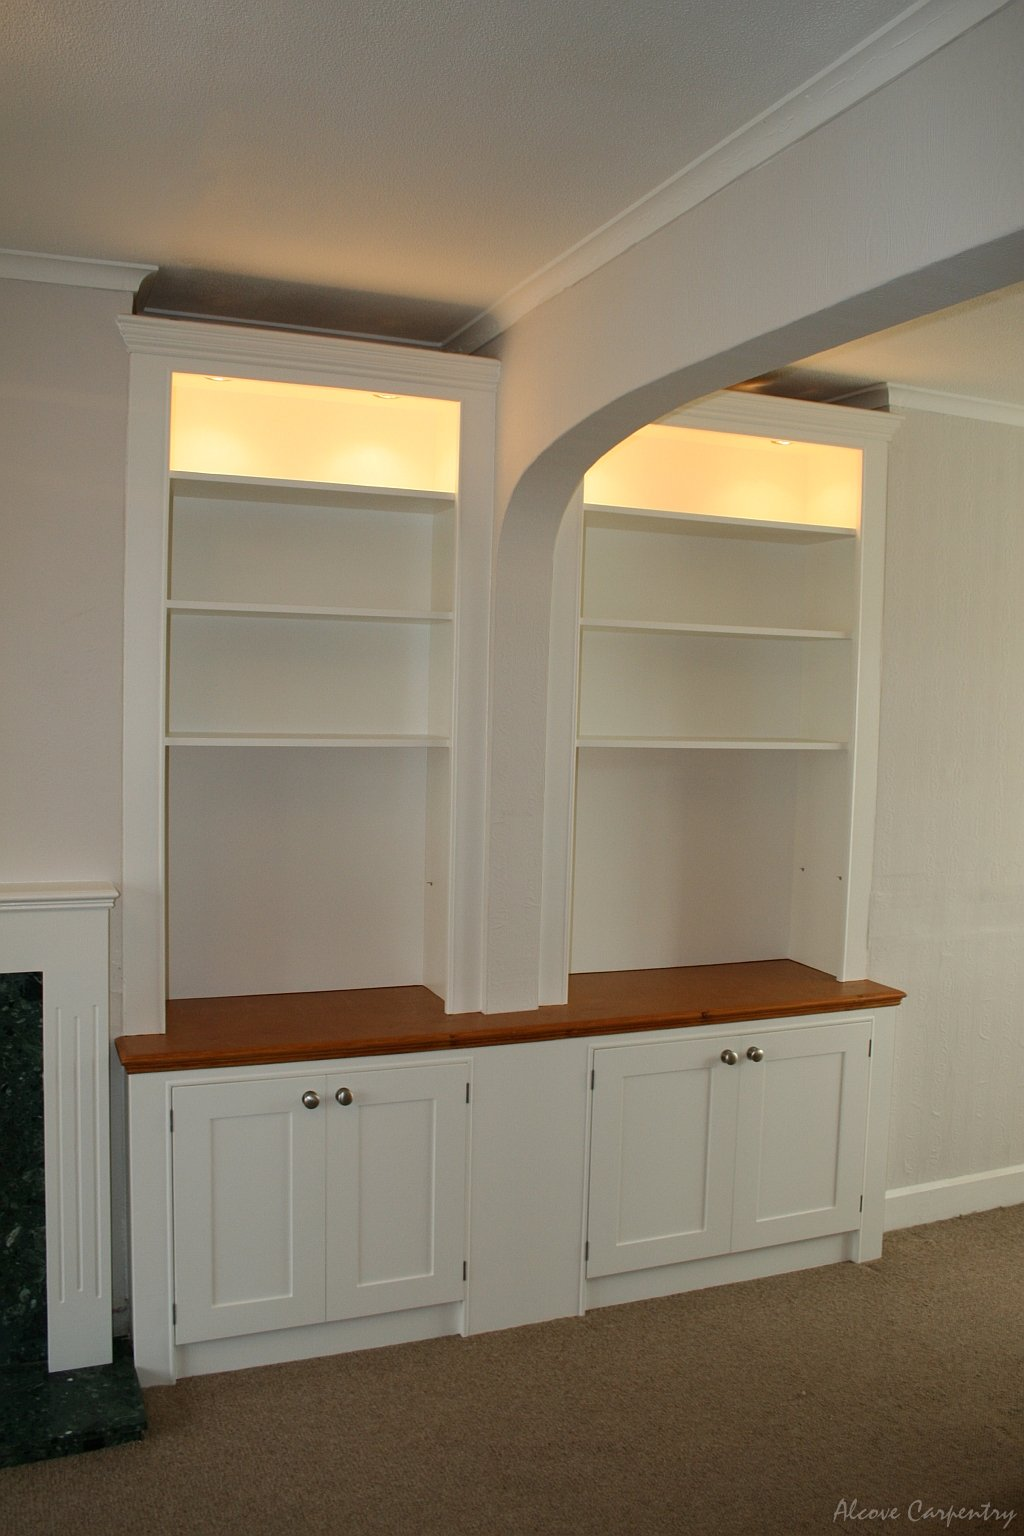 Standard cabinet sizes